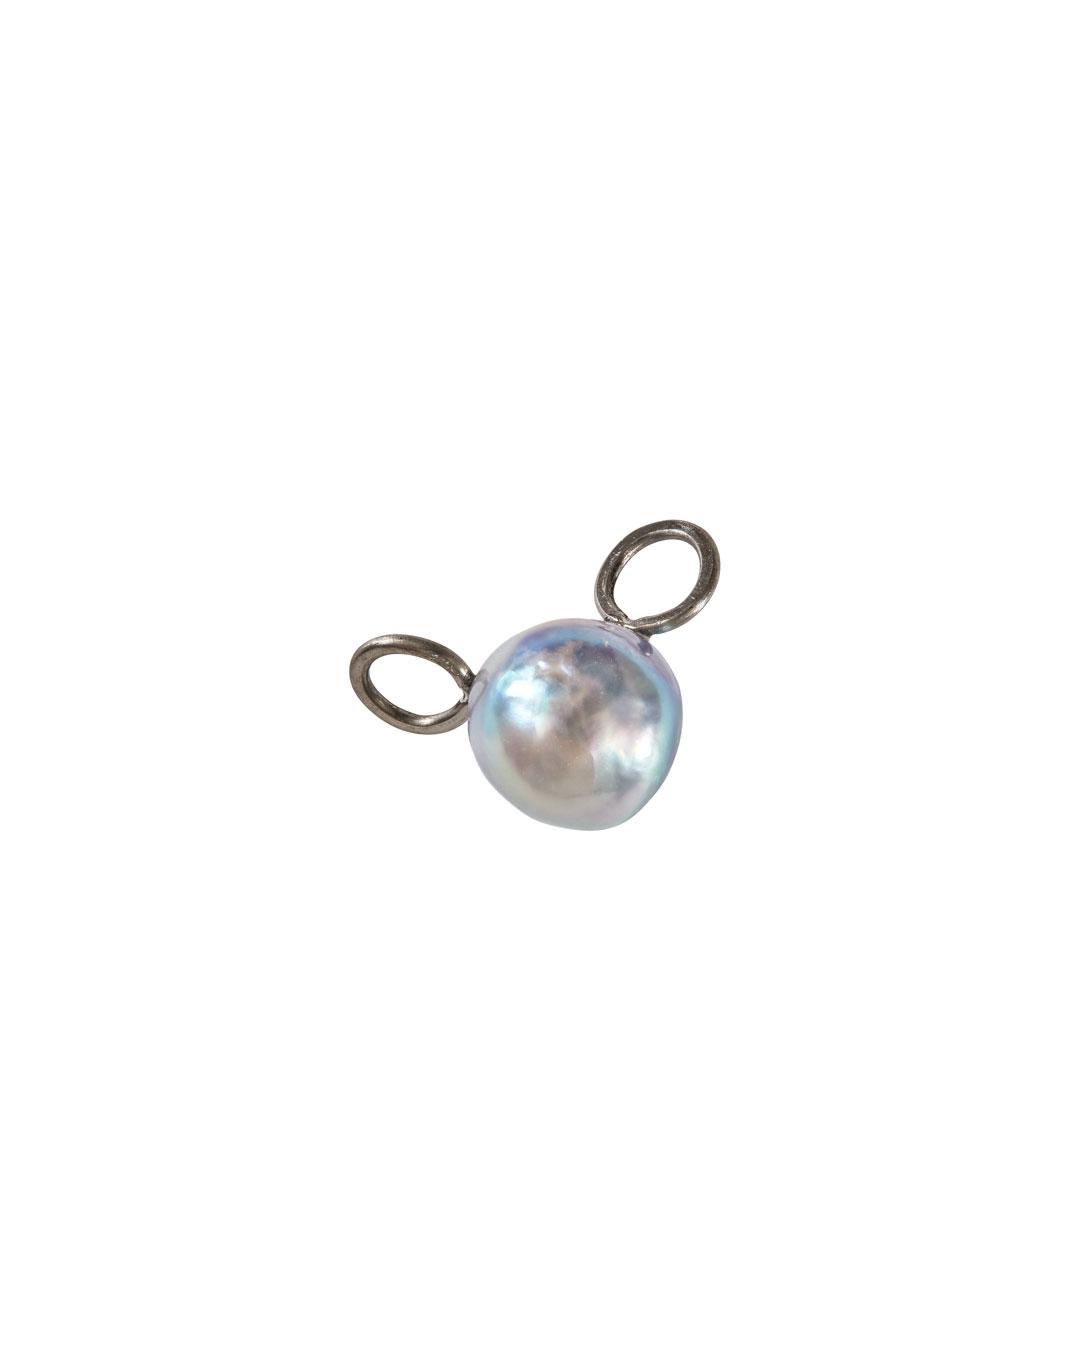 Annelies Planteijdt, Mooie stad - H2O  Watermolecule (Beautiful City - H2O Watermolecule), 2020, charm; Akoya pearl, silver, silk, 10 x 15 mm, €135